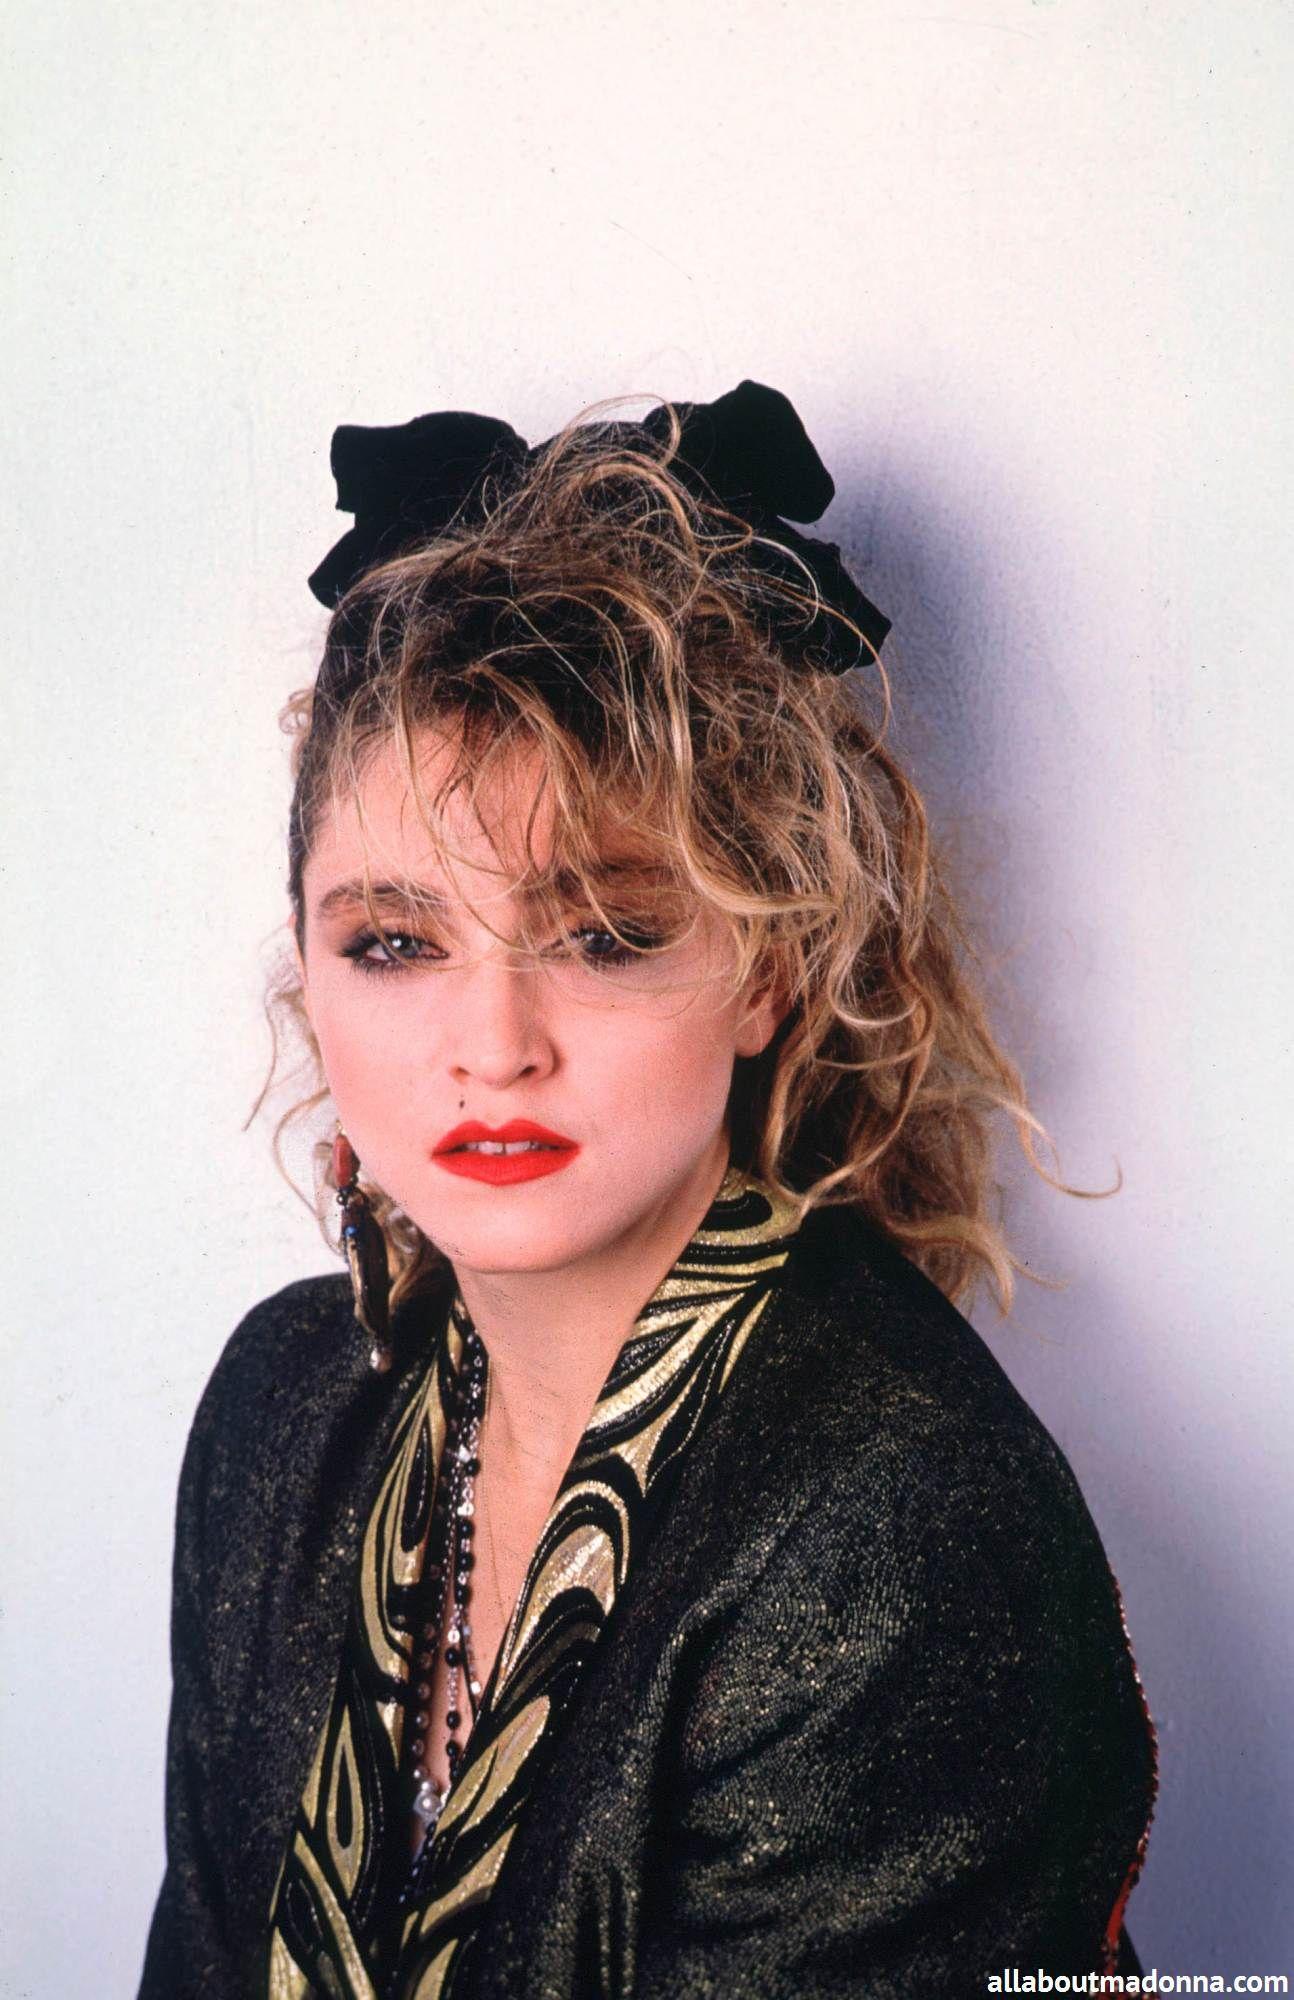 Madonna in Desperately Seeking Susan Madonna's 80's